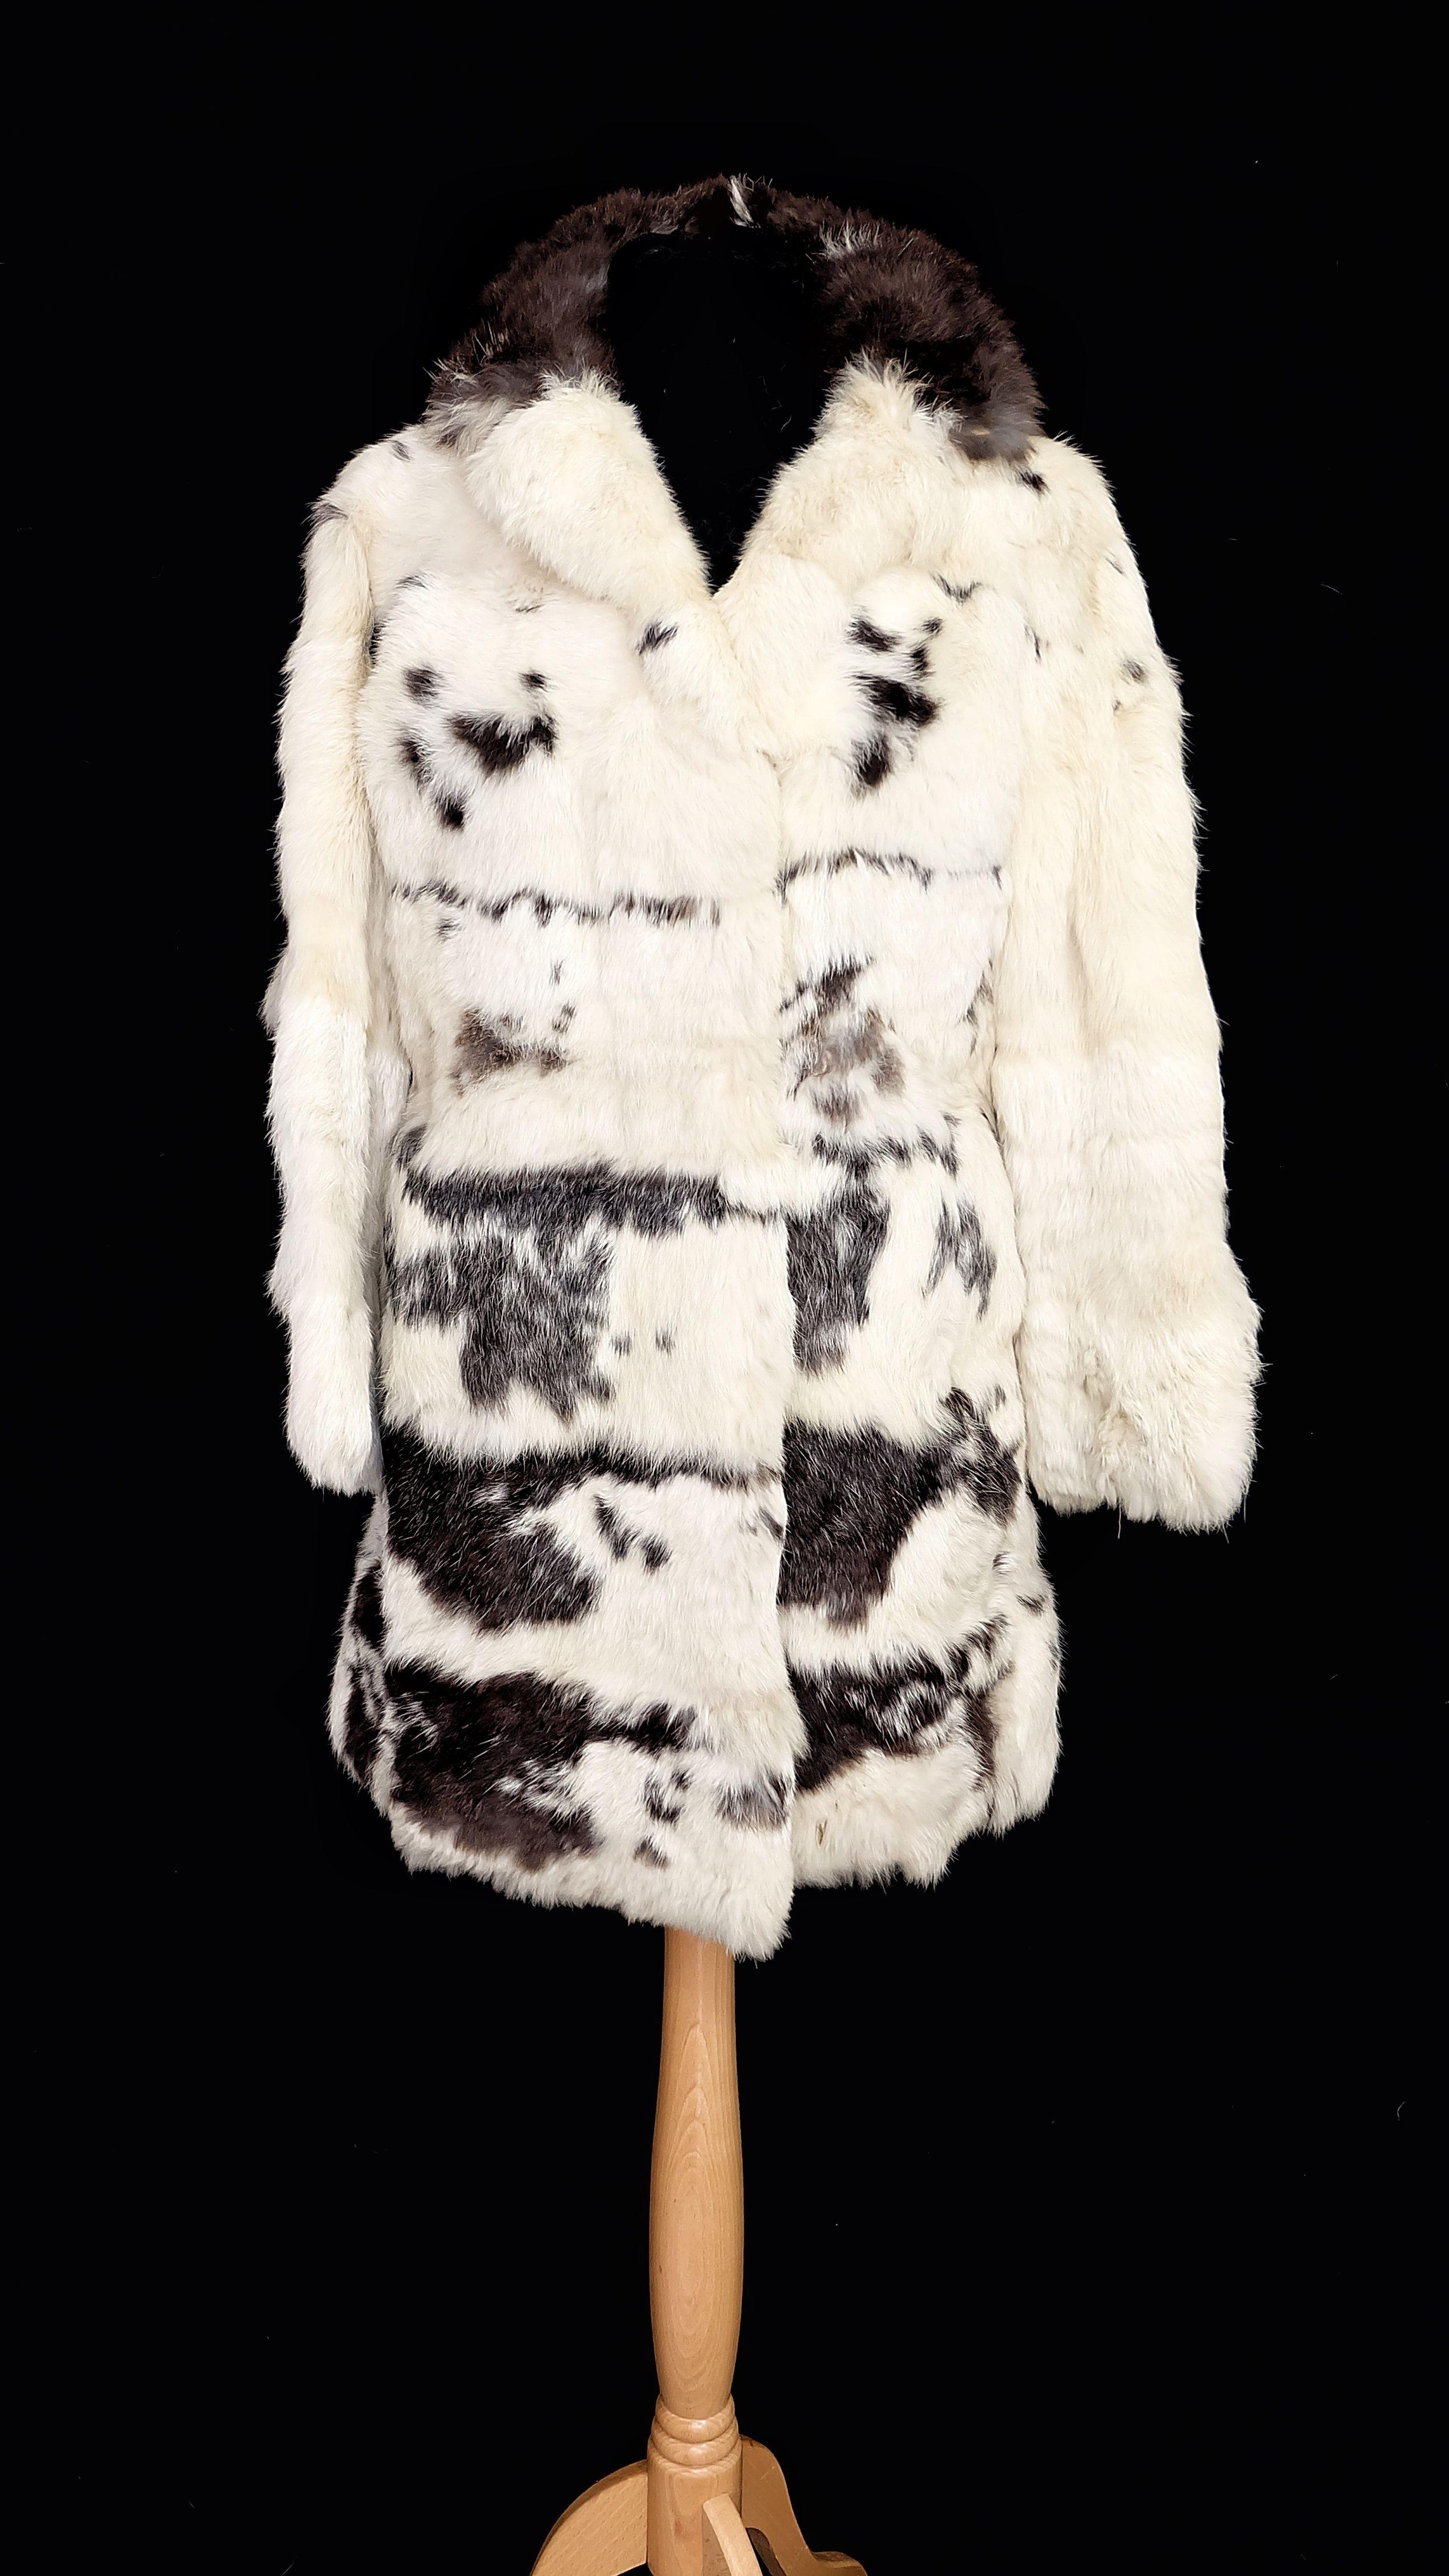 Vintage Rabbit Black And White Cosy Real Fur Etsy Vintage Fur Jacket Fur Coat Vintage Black And White Rabbit [ 4509 x 2536 Pixel ]